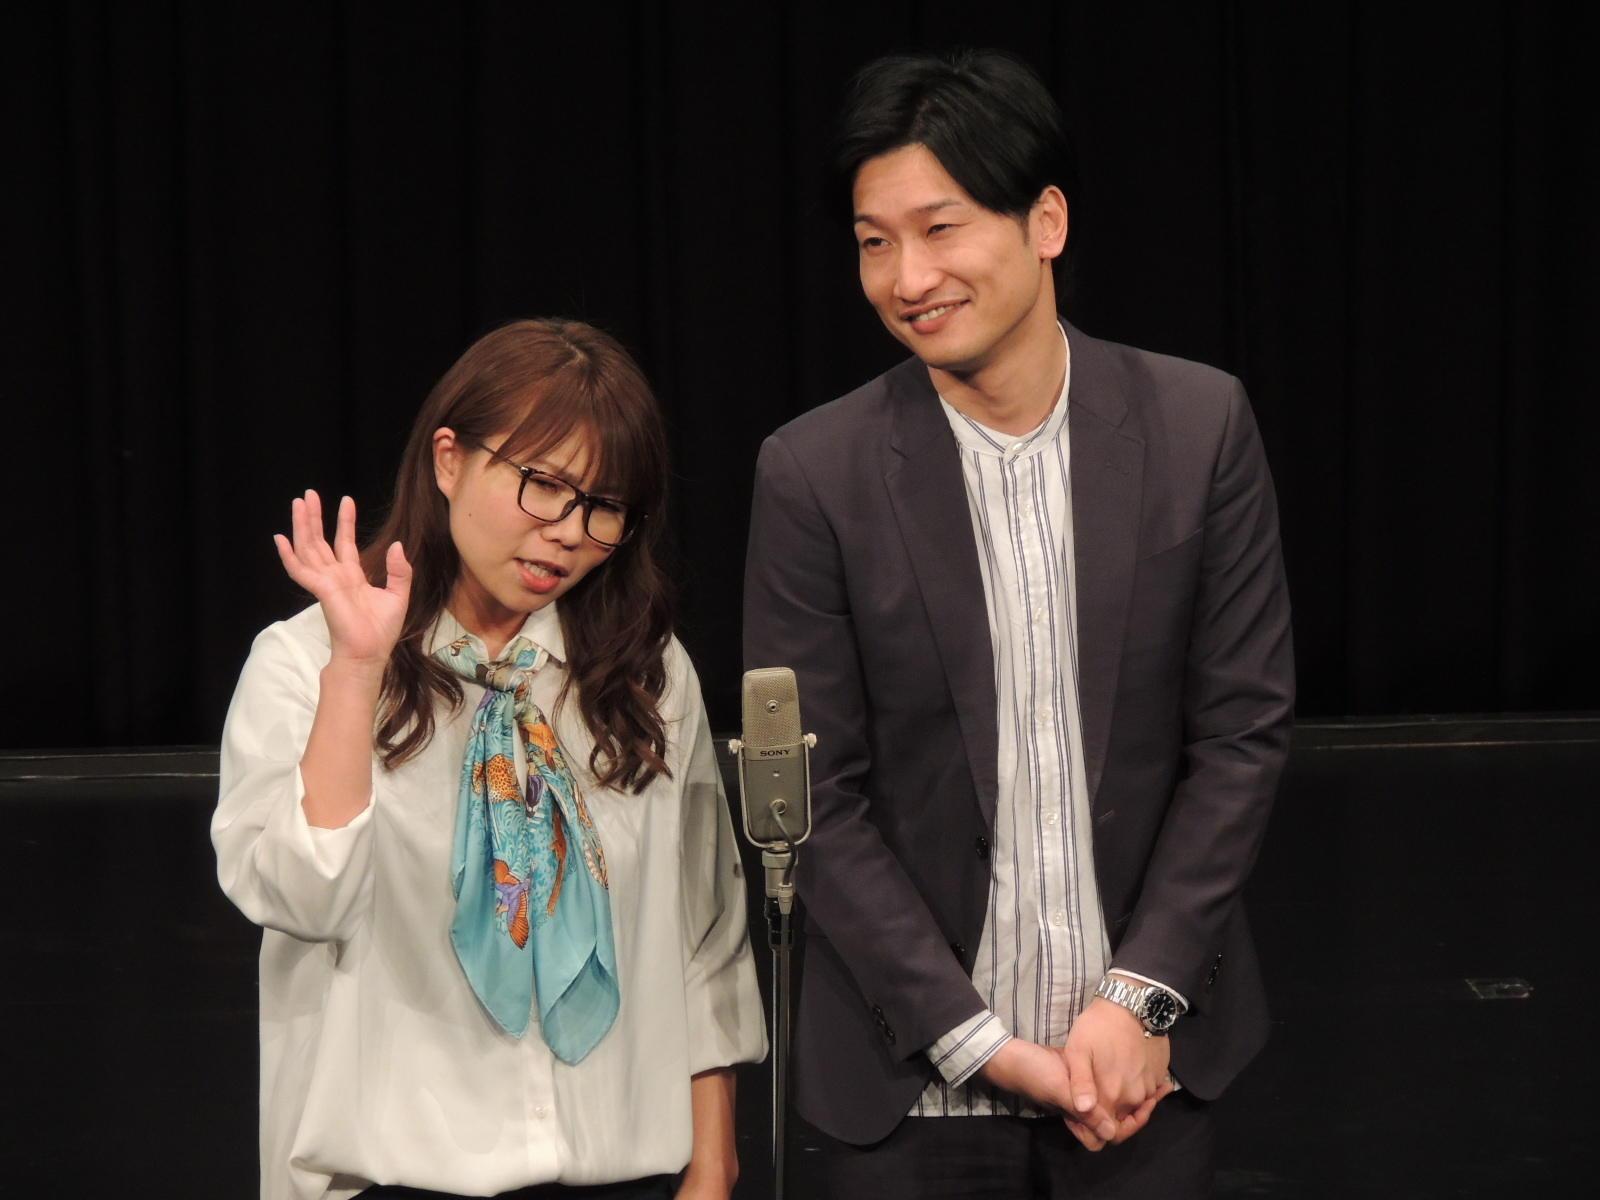 http://news.yoshimoto.co.jp/20190109211506-6fc1833a4167c71d5a0dd3e98c1abe35144a0141.jpg